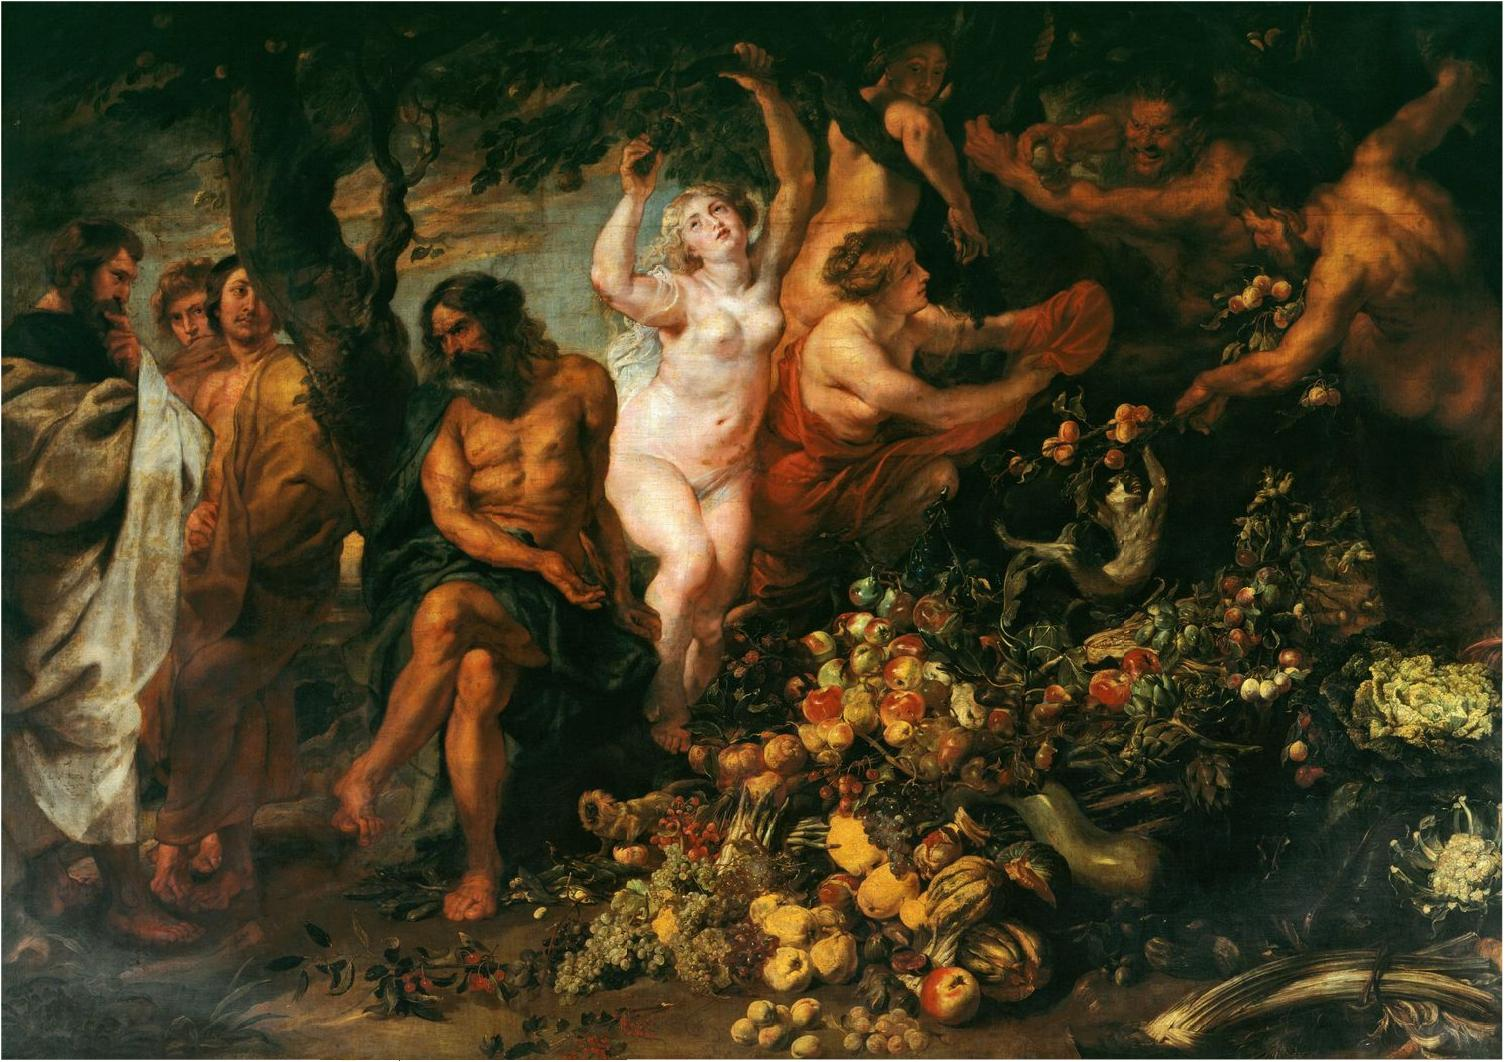 Peter Paul Rubens, Pythagoras advocating vegetarianism, 1618-20, Royal Collection